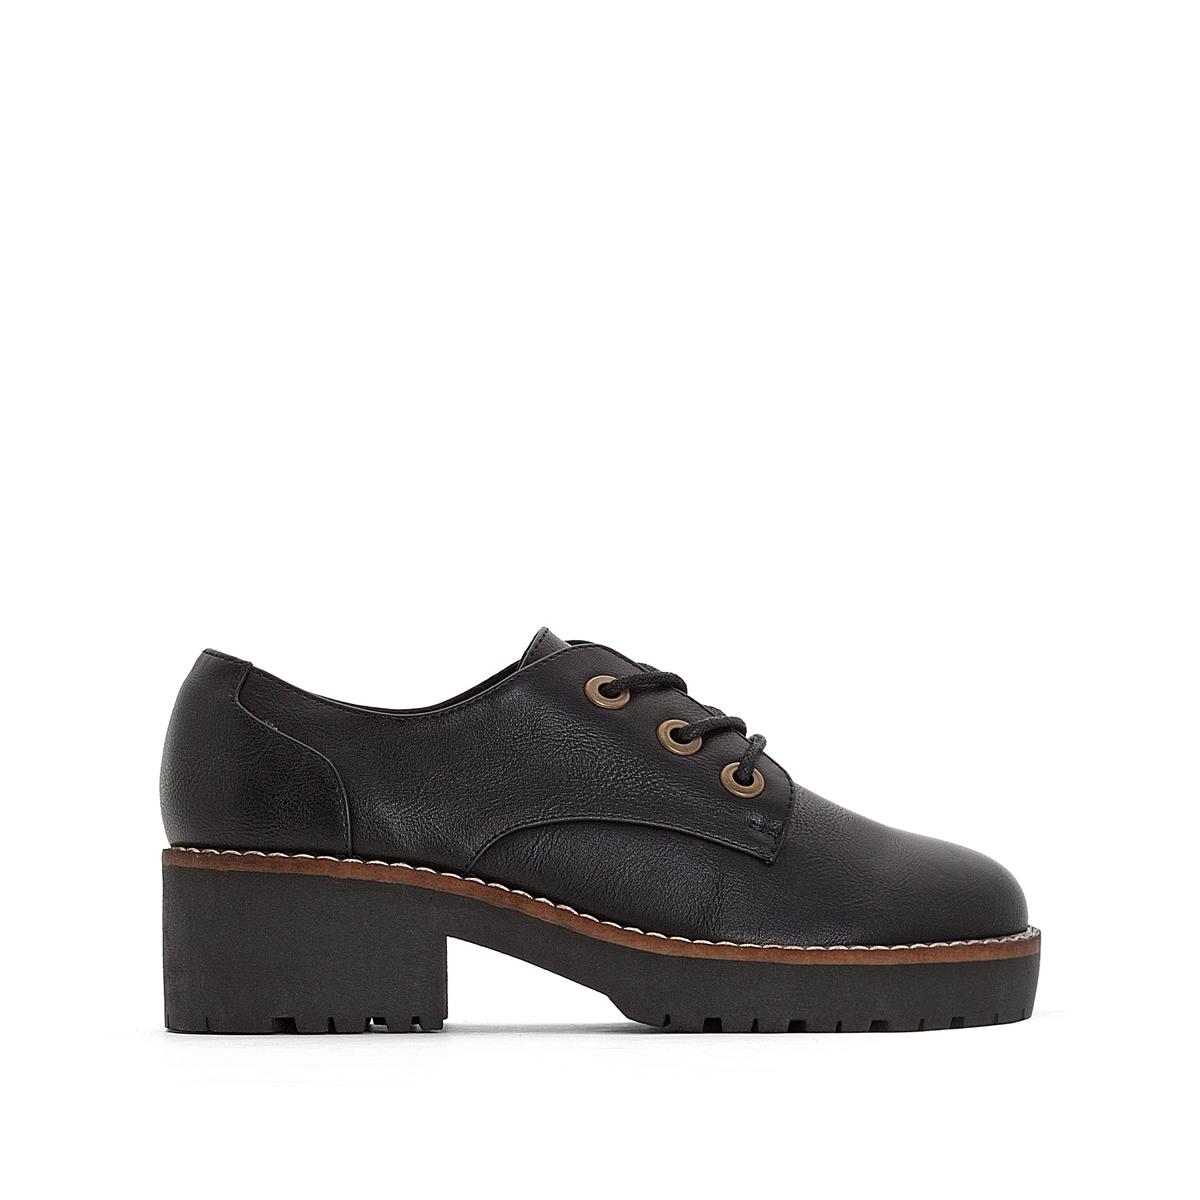 купить Ботинки-дерби на каблуке Cherblu недорого